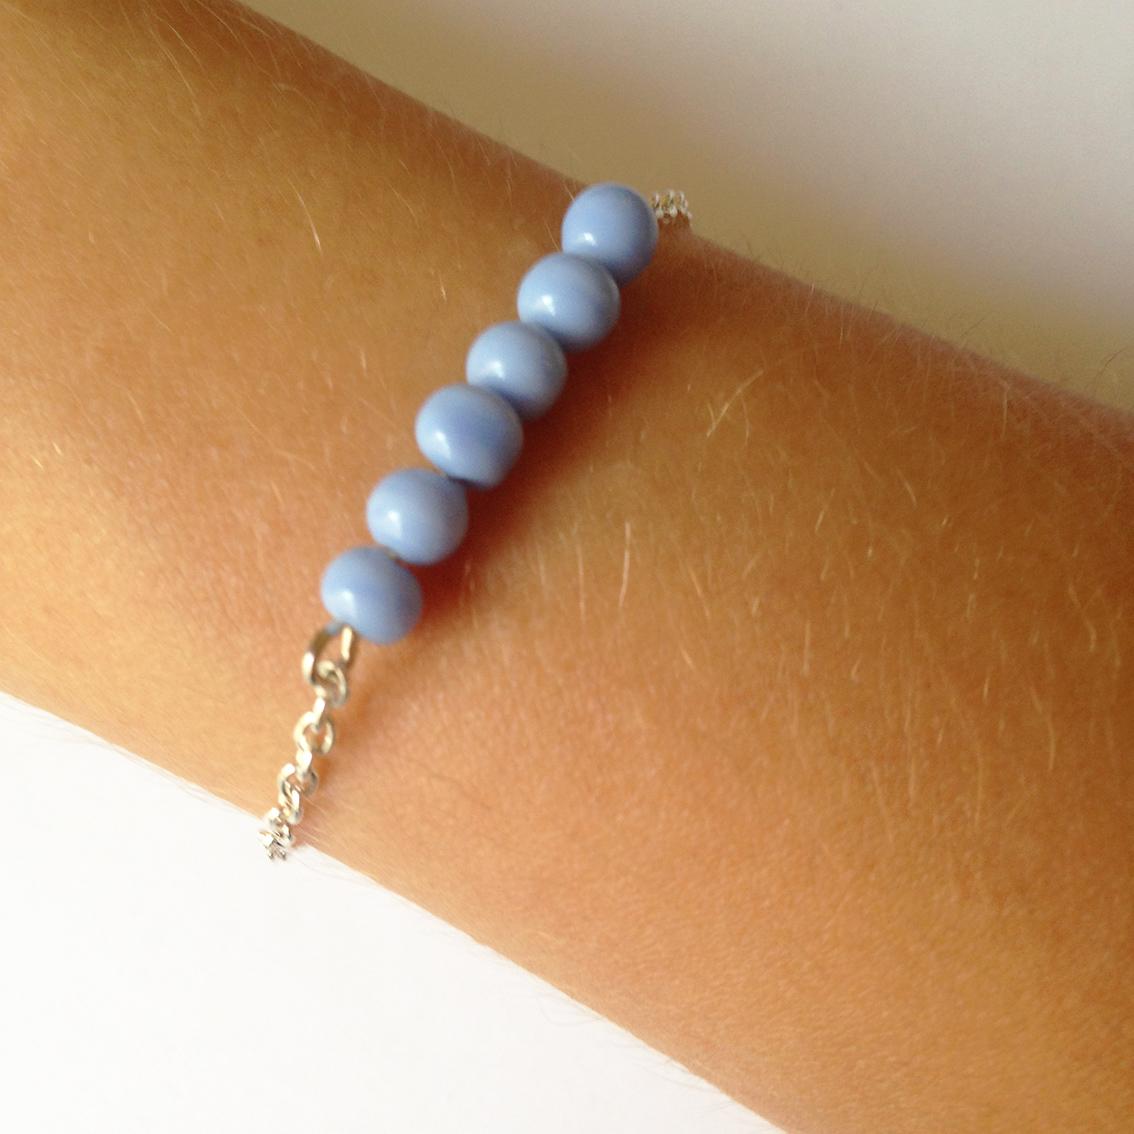 Bracelet Bulle petites perles bleu clair